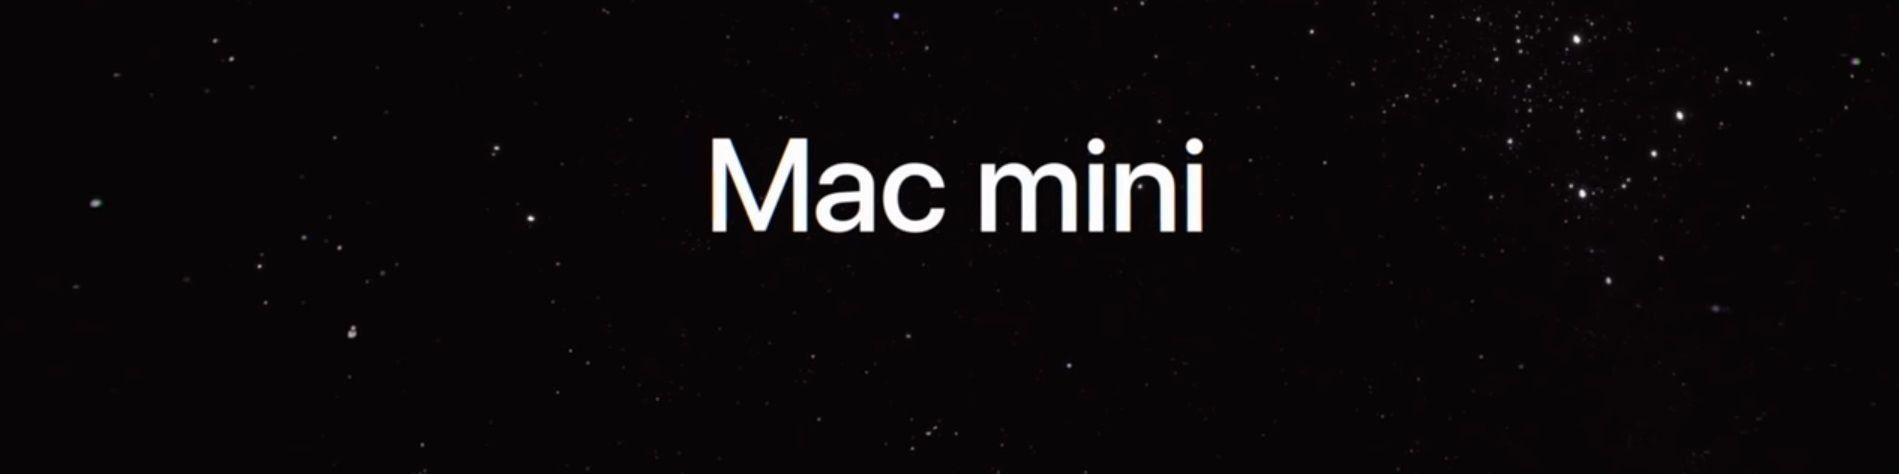 Apple Mac mini 2018 – достоинства и недостатки